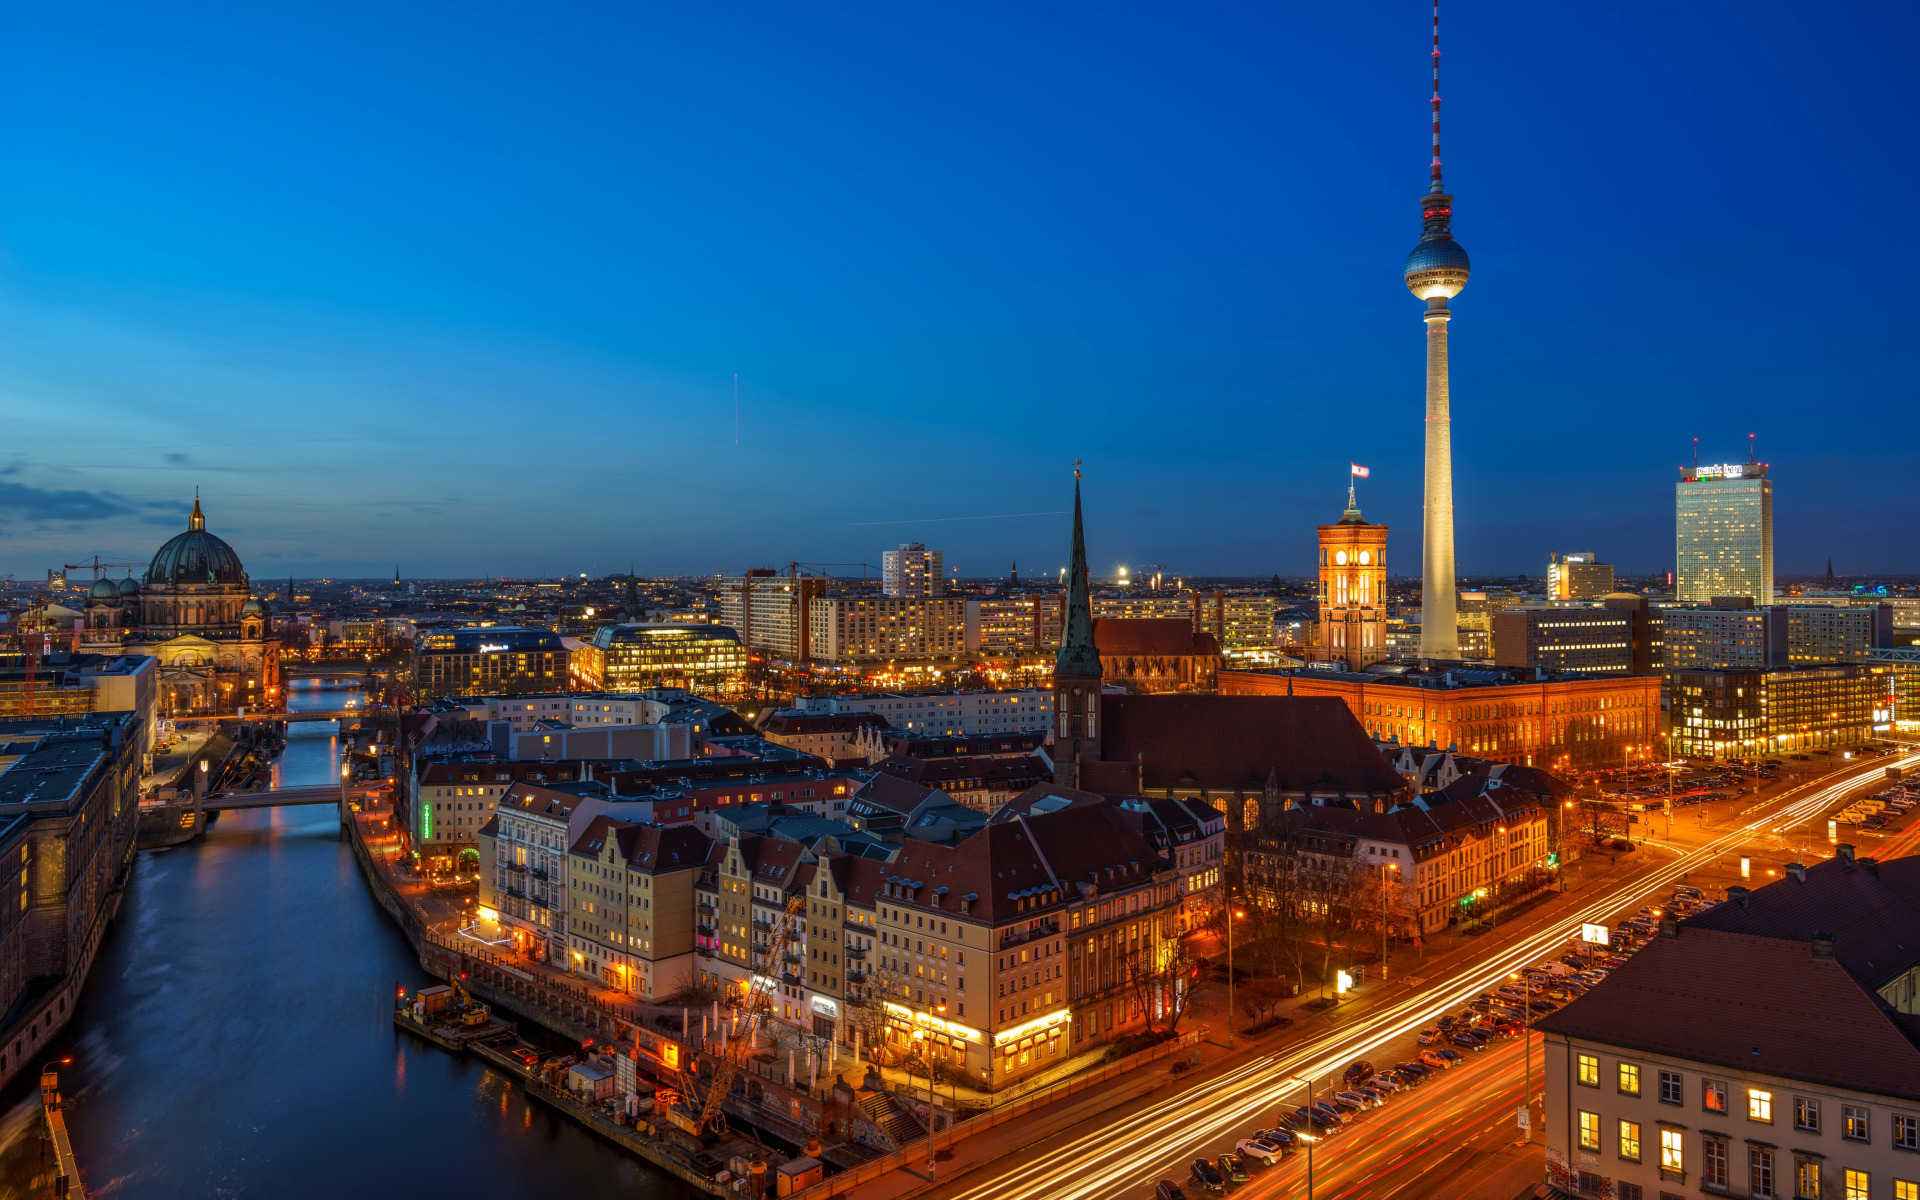 картинки про немецкий город берлин открытии